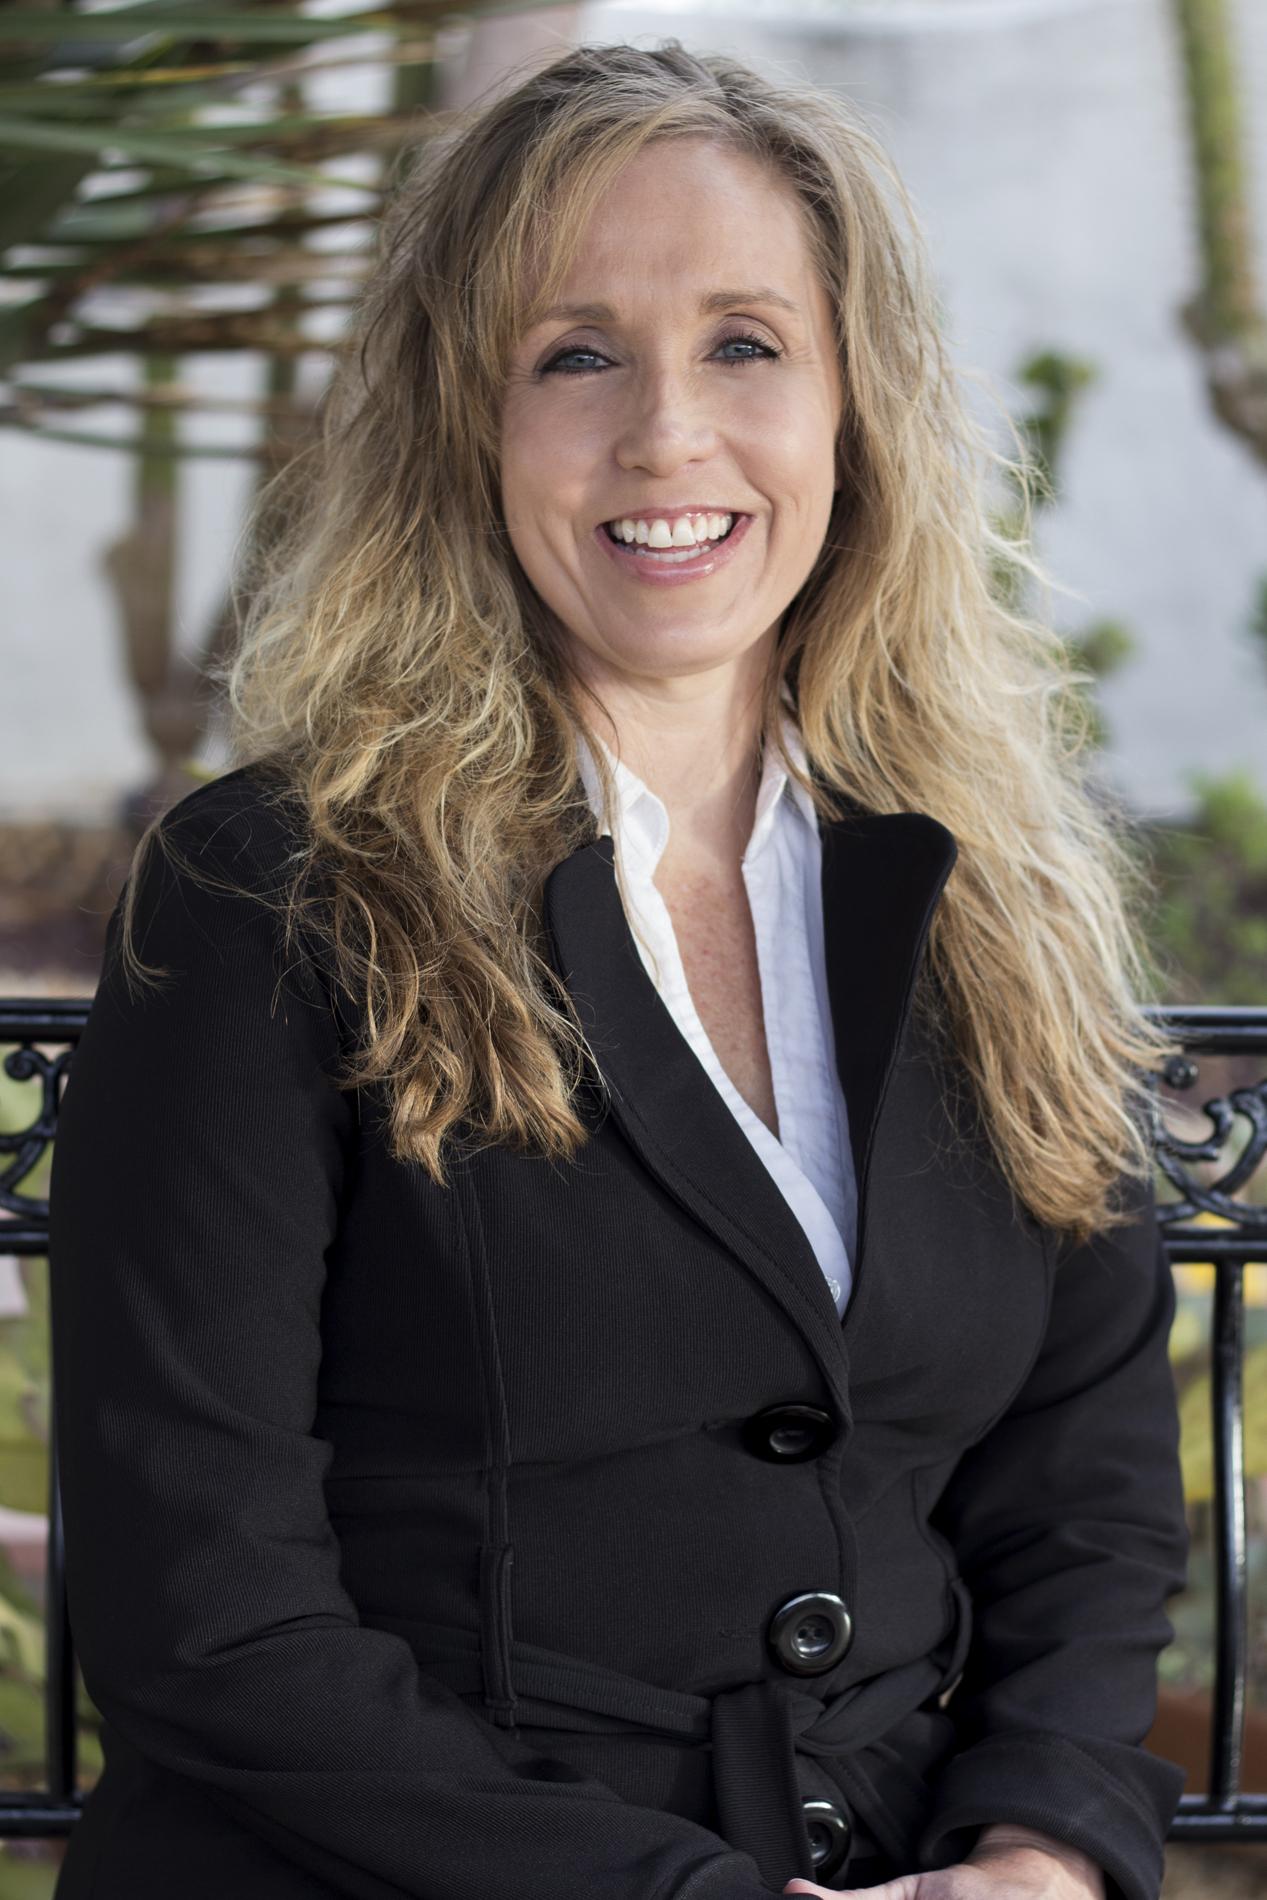 Photo of Rachel Moore Loan Officer